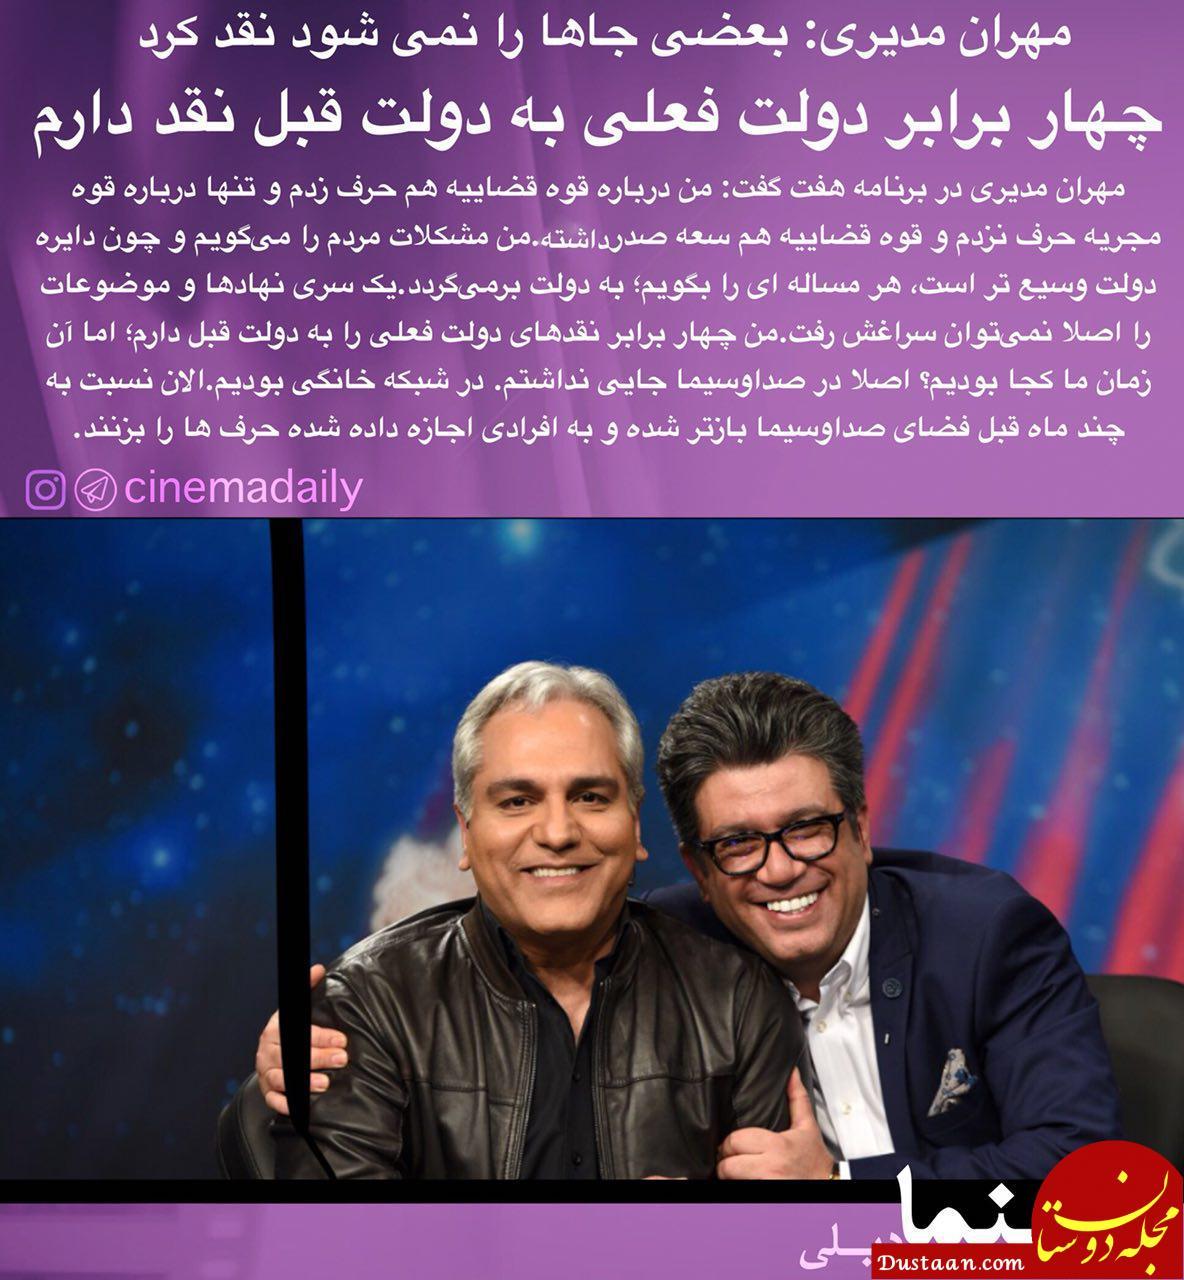 www.dustaan.com مهران مدیری : من خودم کارگر زاده ام +فیلم